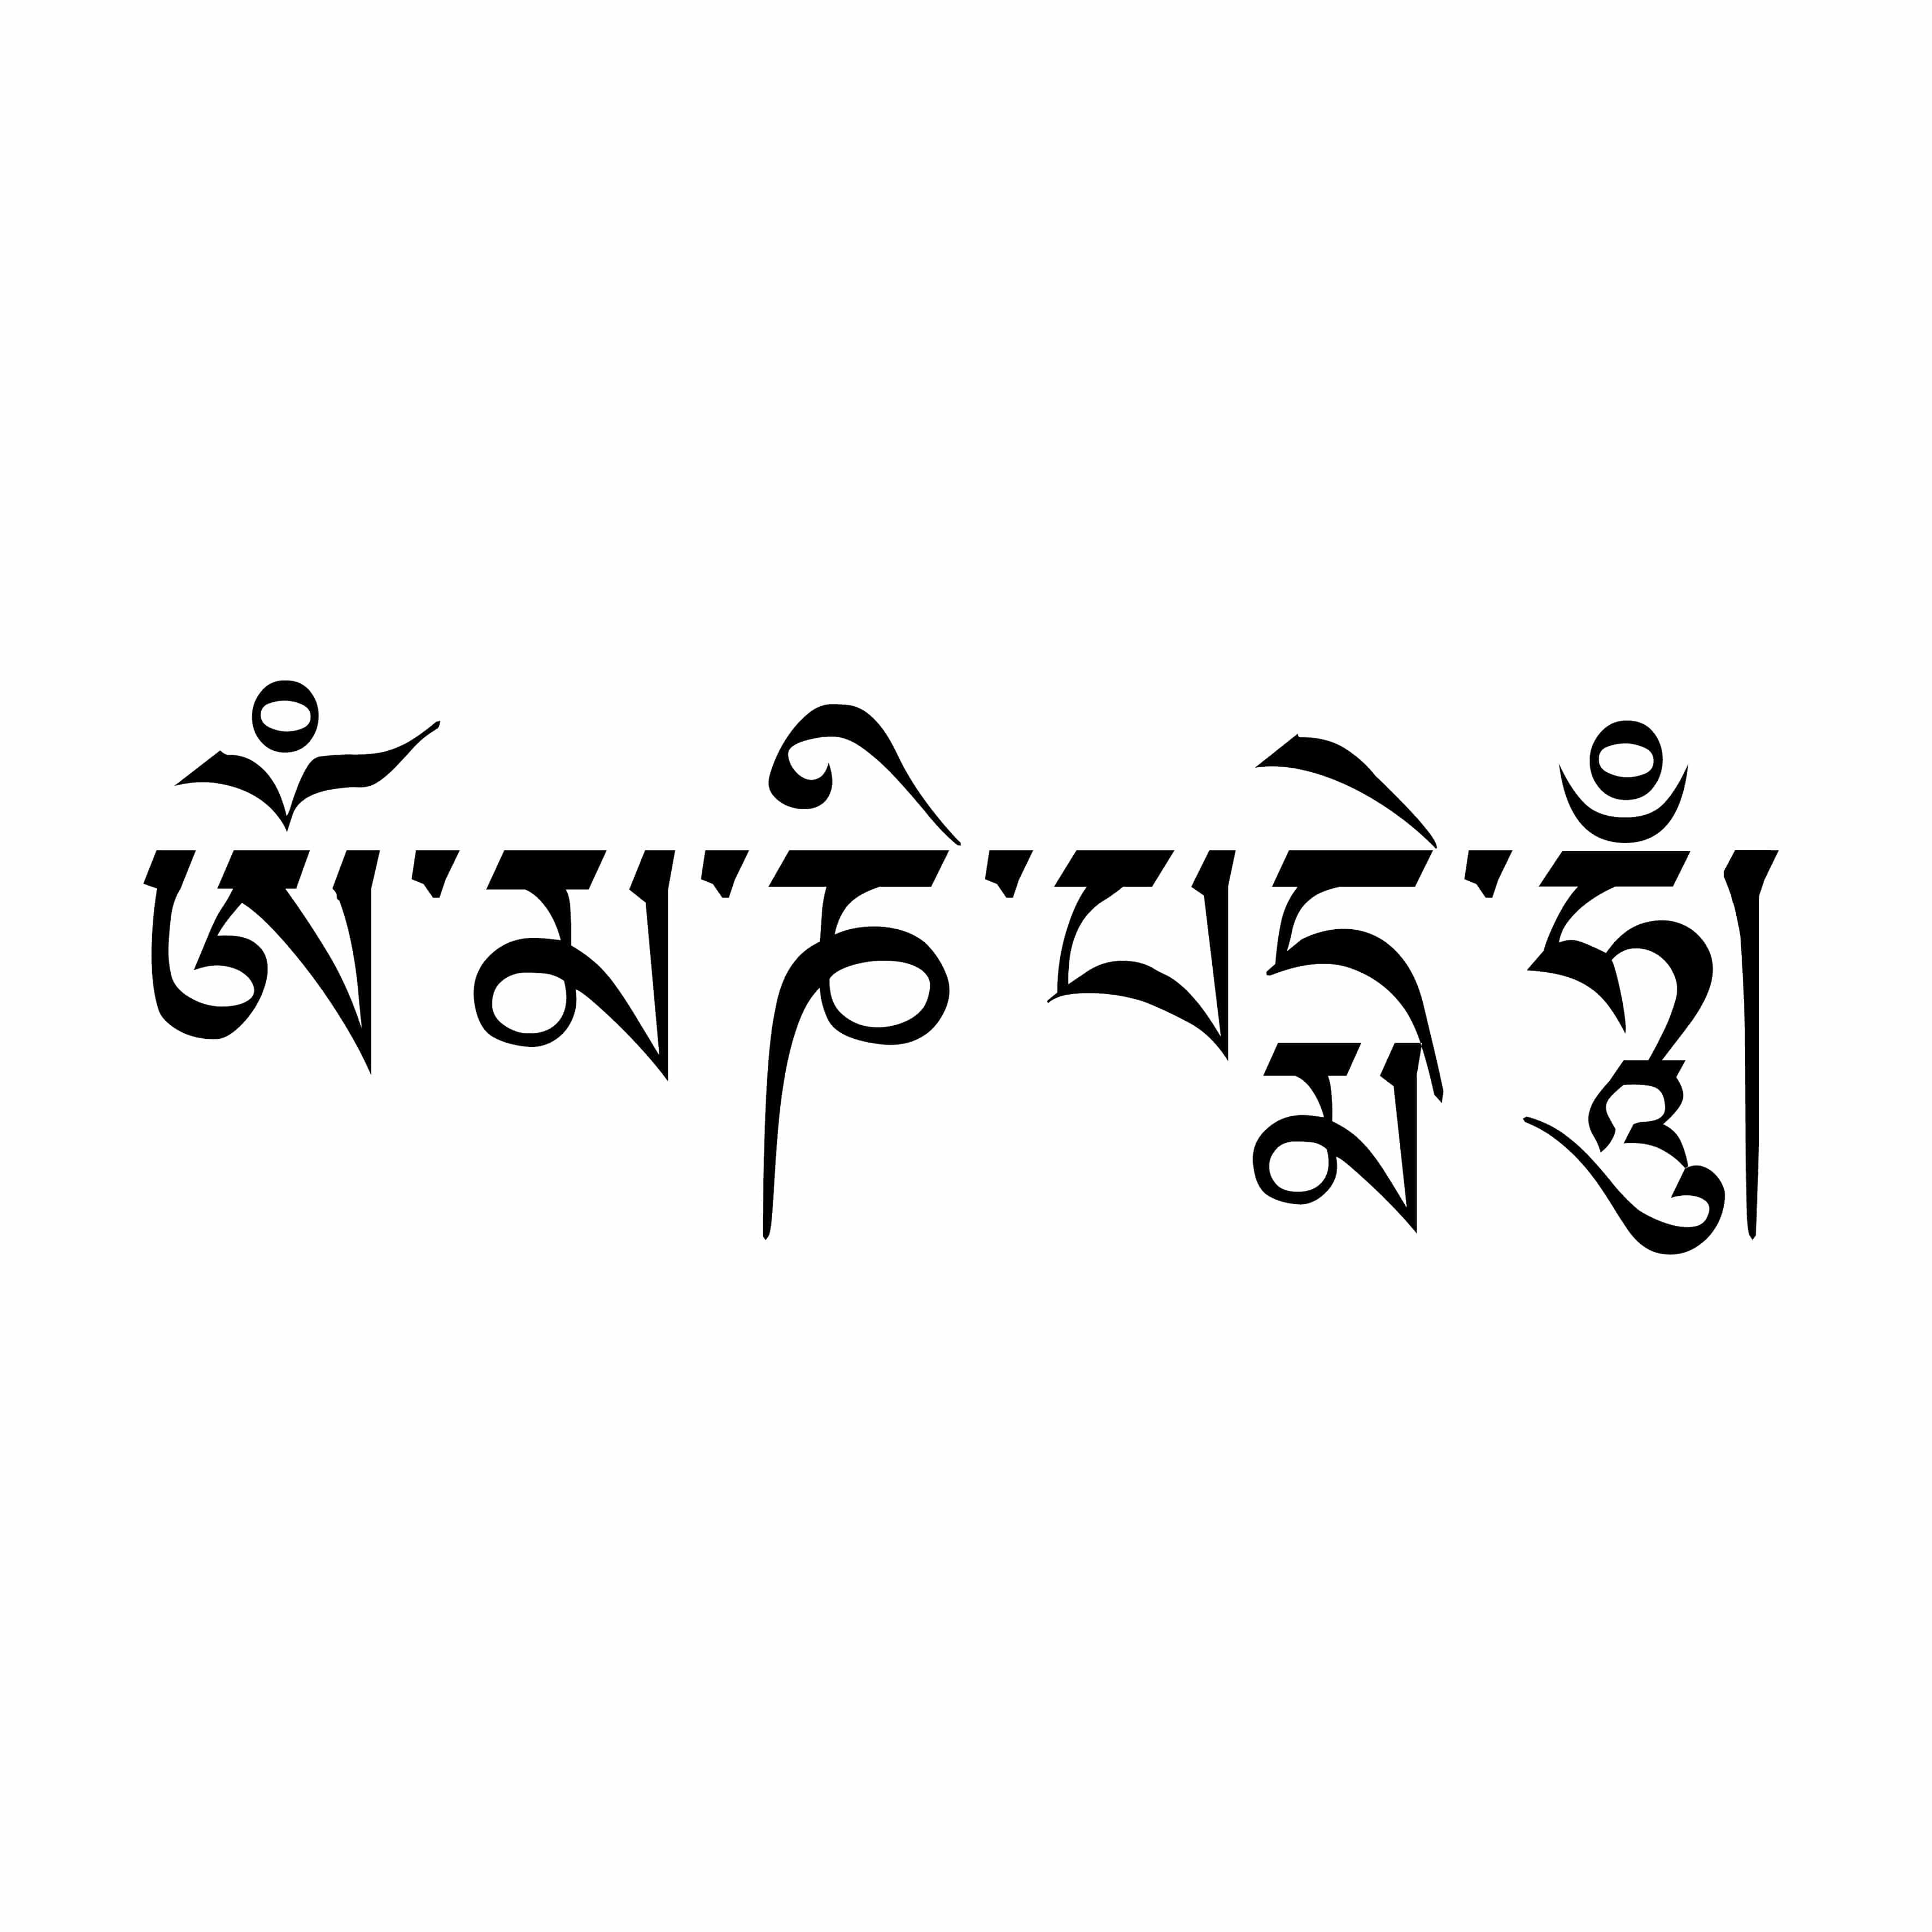 6dcadbeb760e8 Om Mani Padme Hum - Great Stupa of Universal Compassion